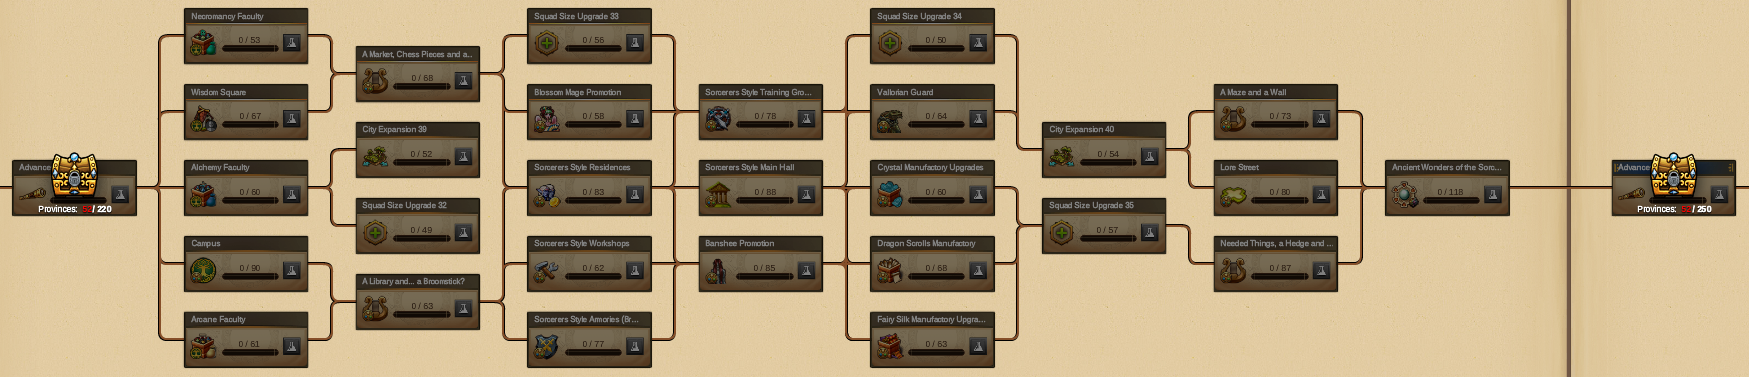 Elvenar Sorcerers & Dragons - Planning Research